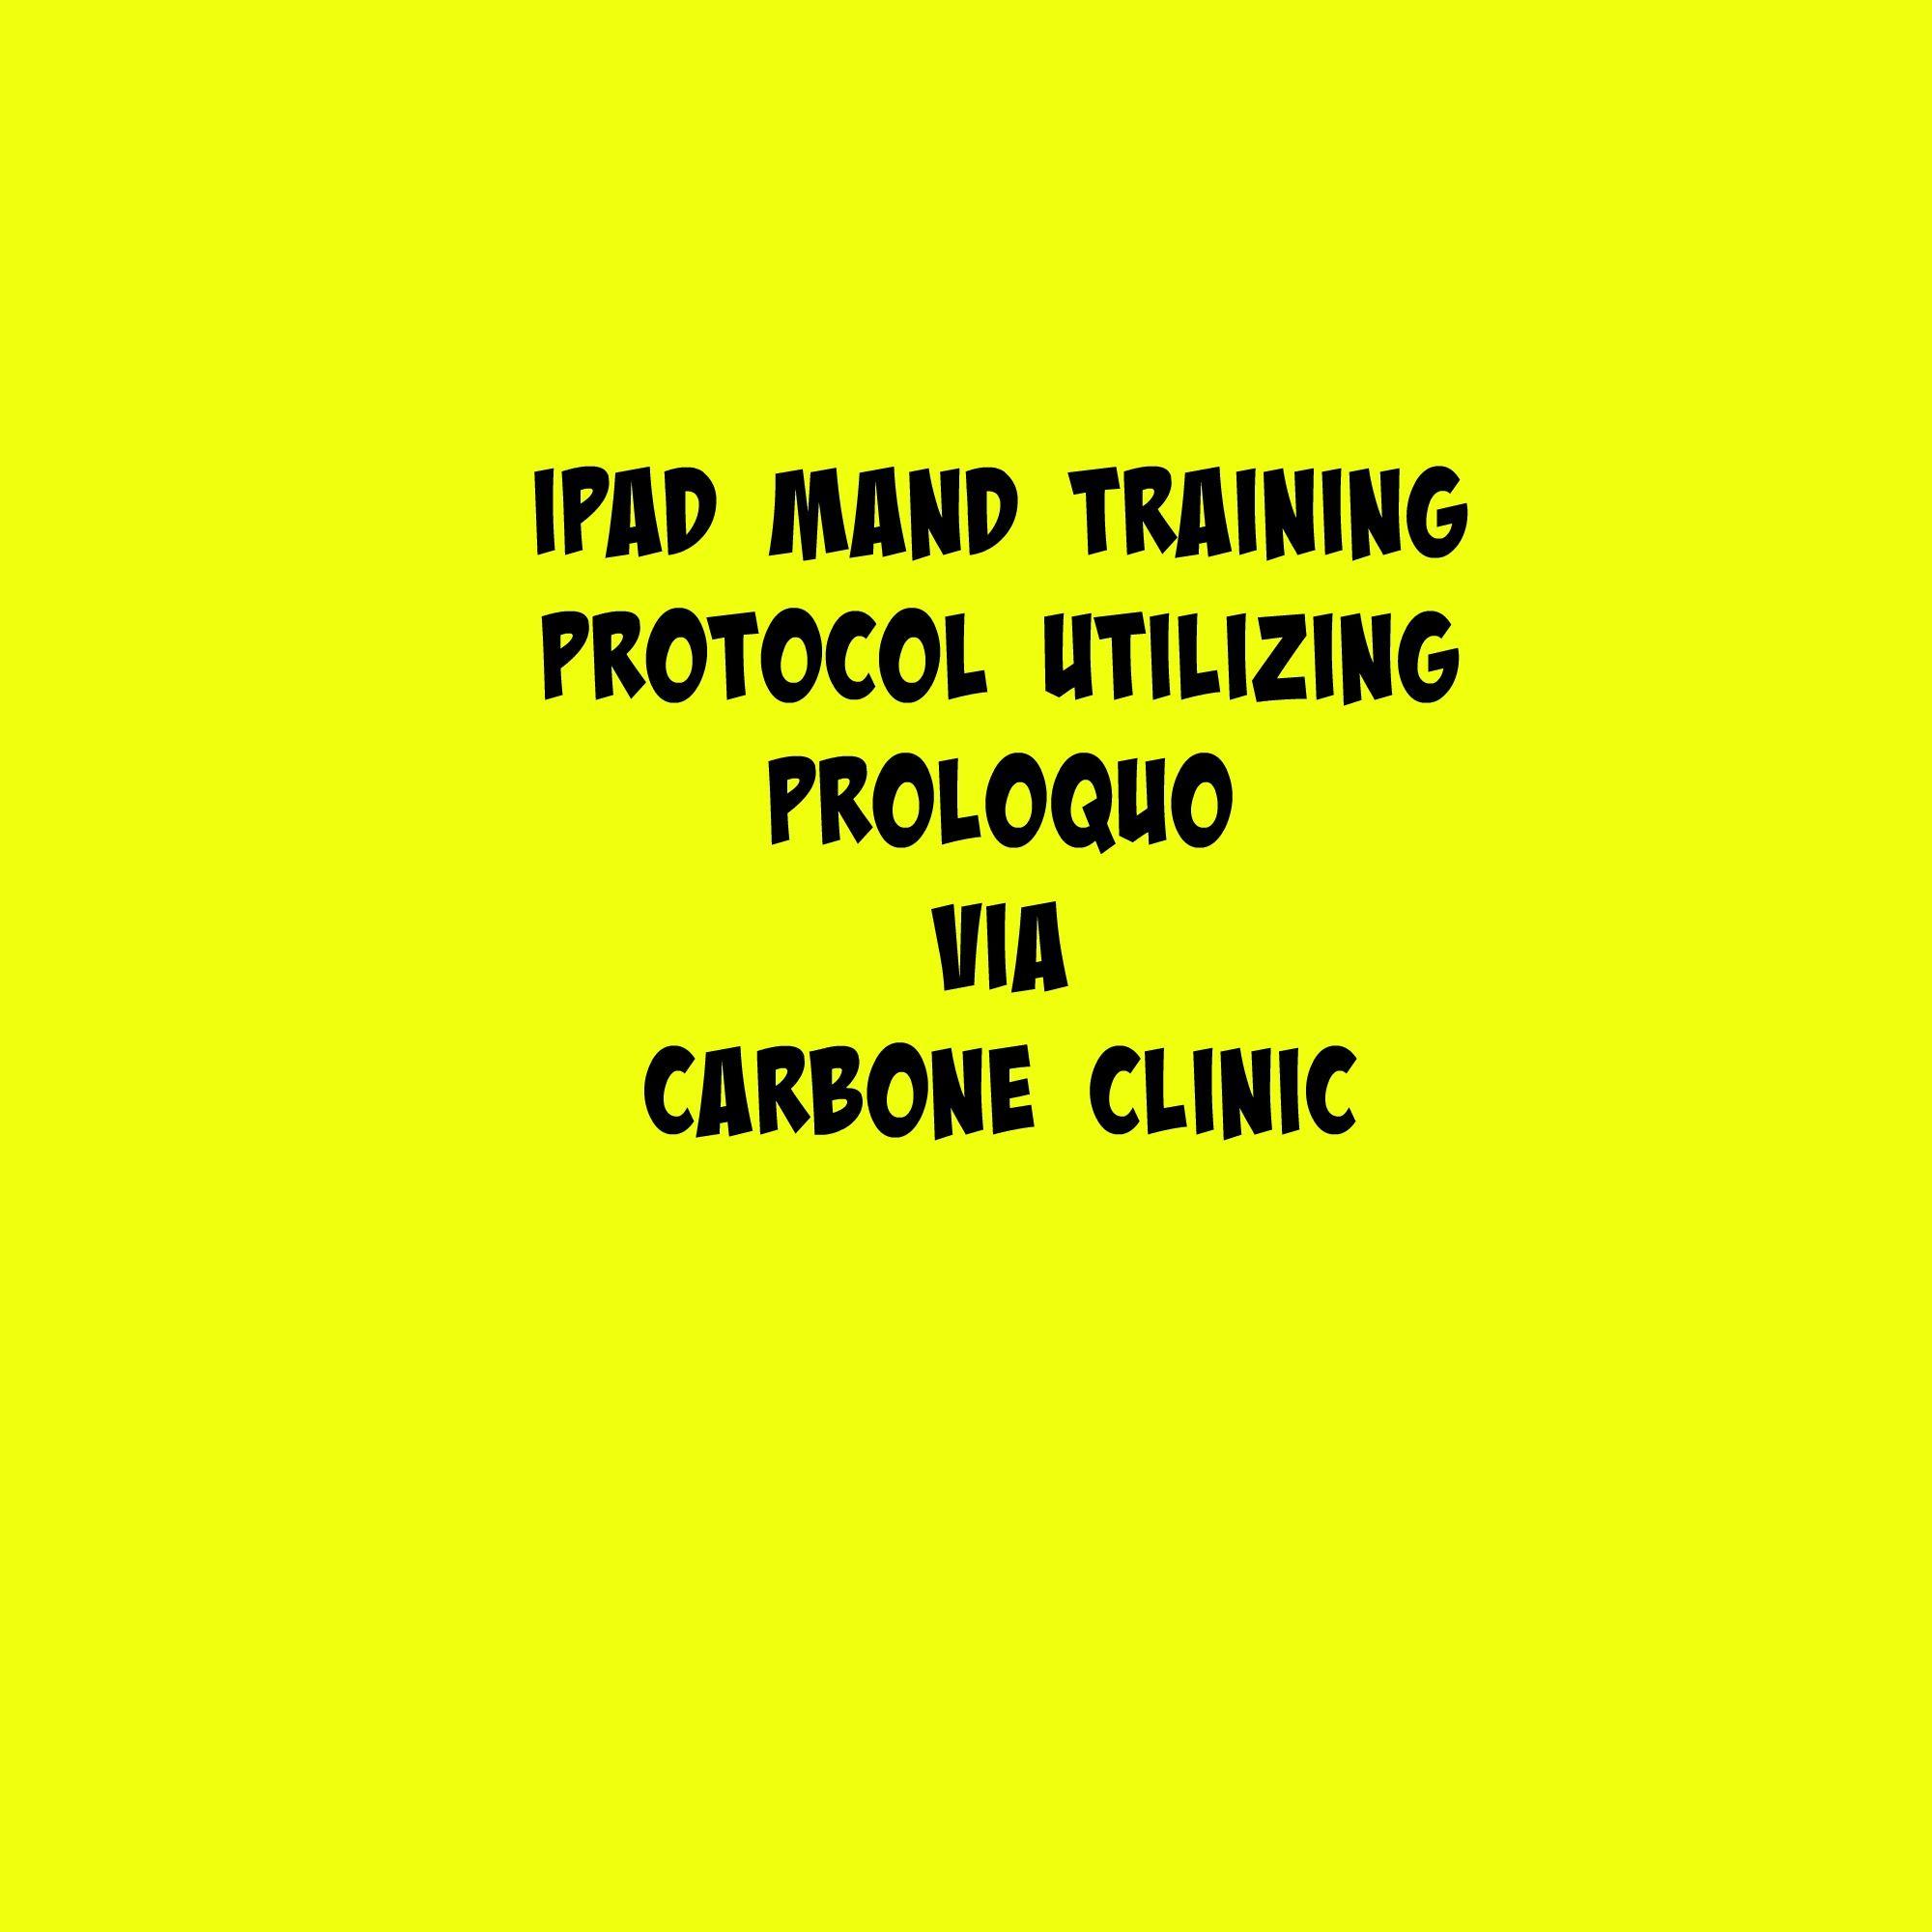 Ipad Mand Training Protocol Utilizing Proloquo Via Carbone